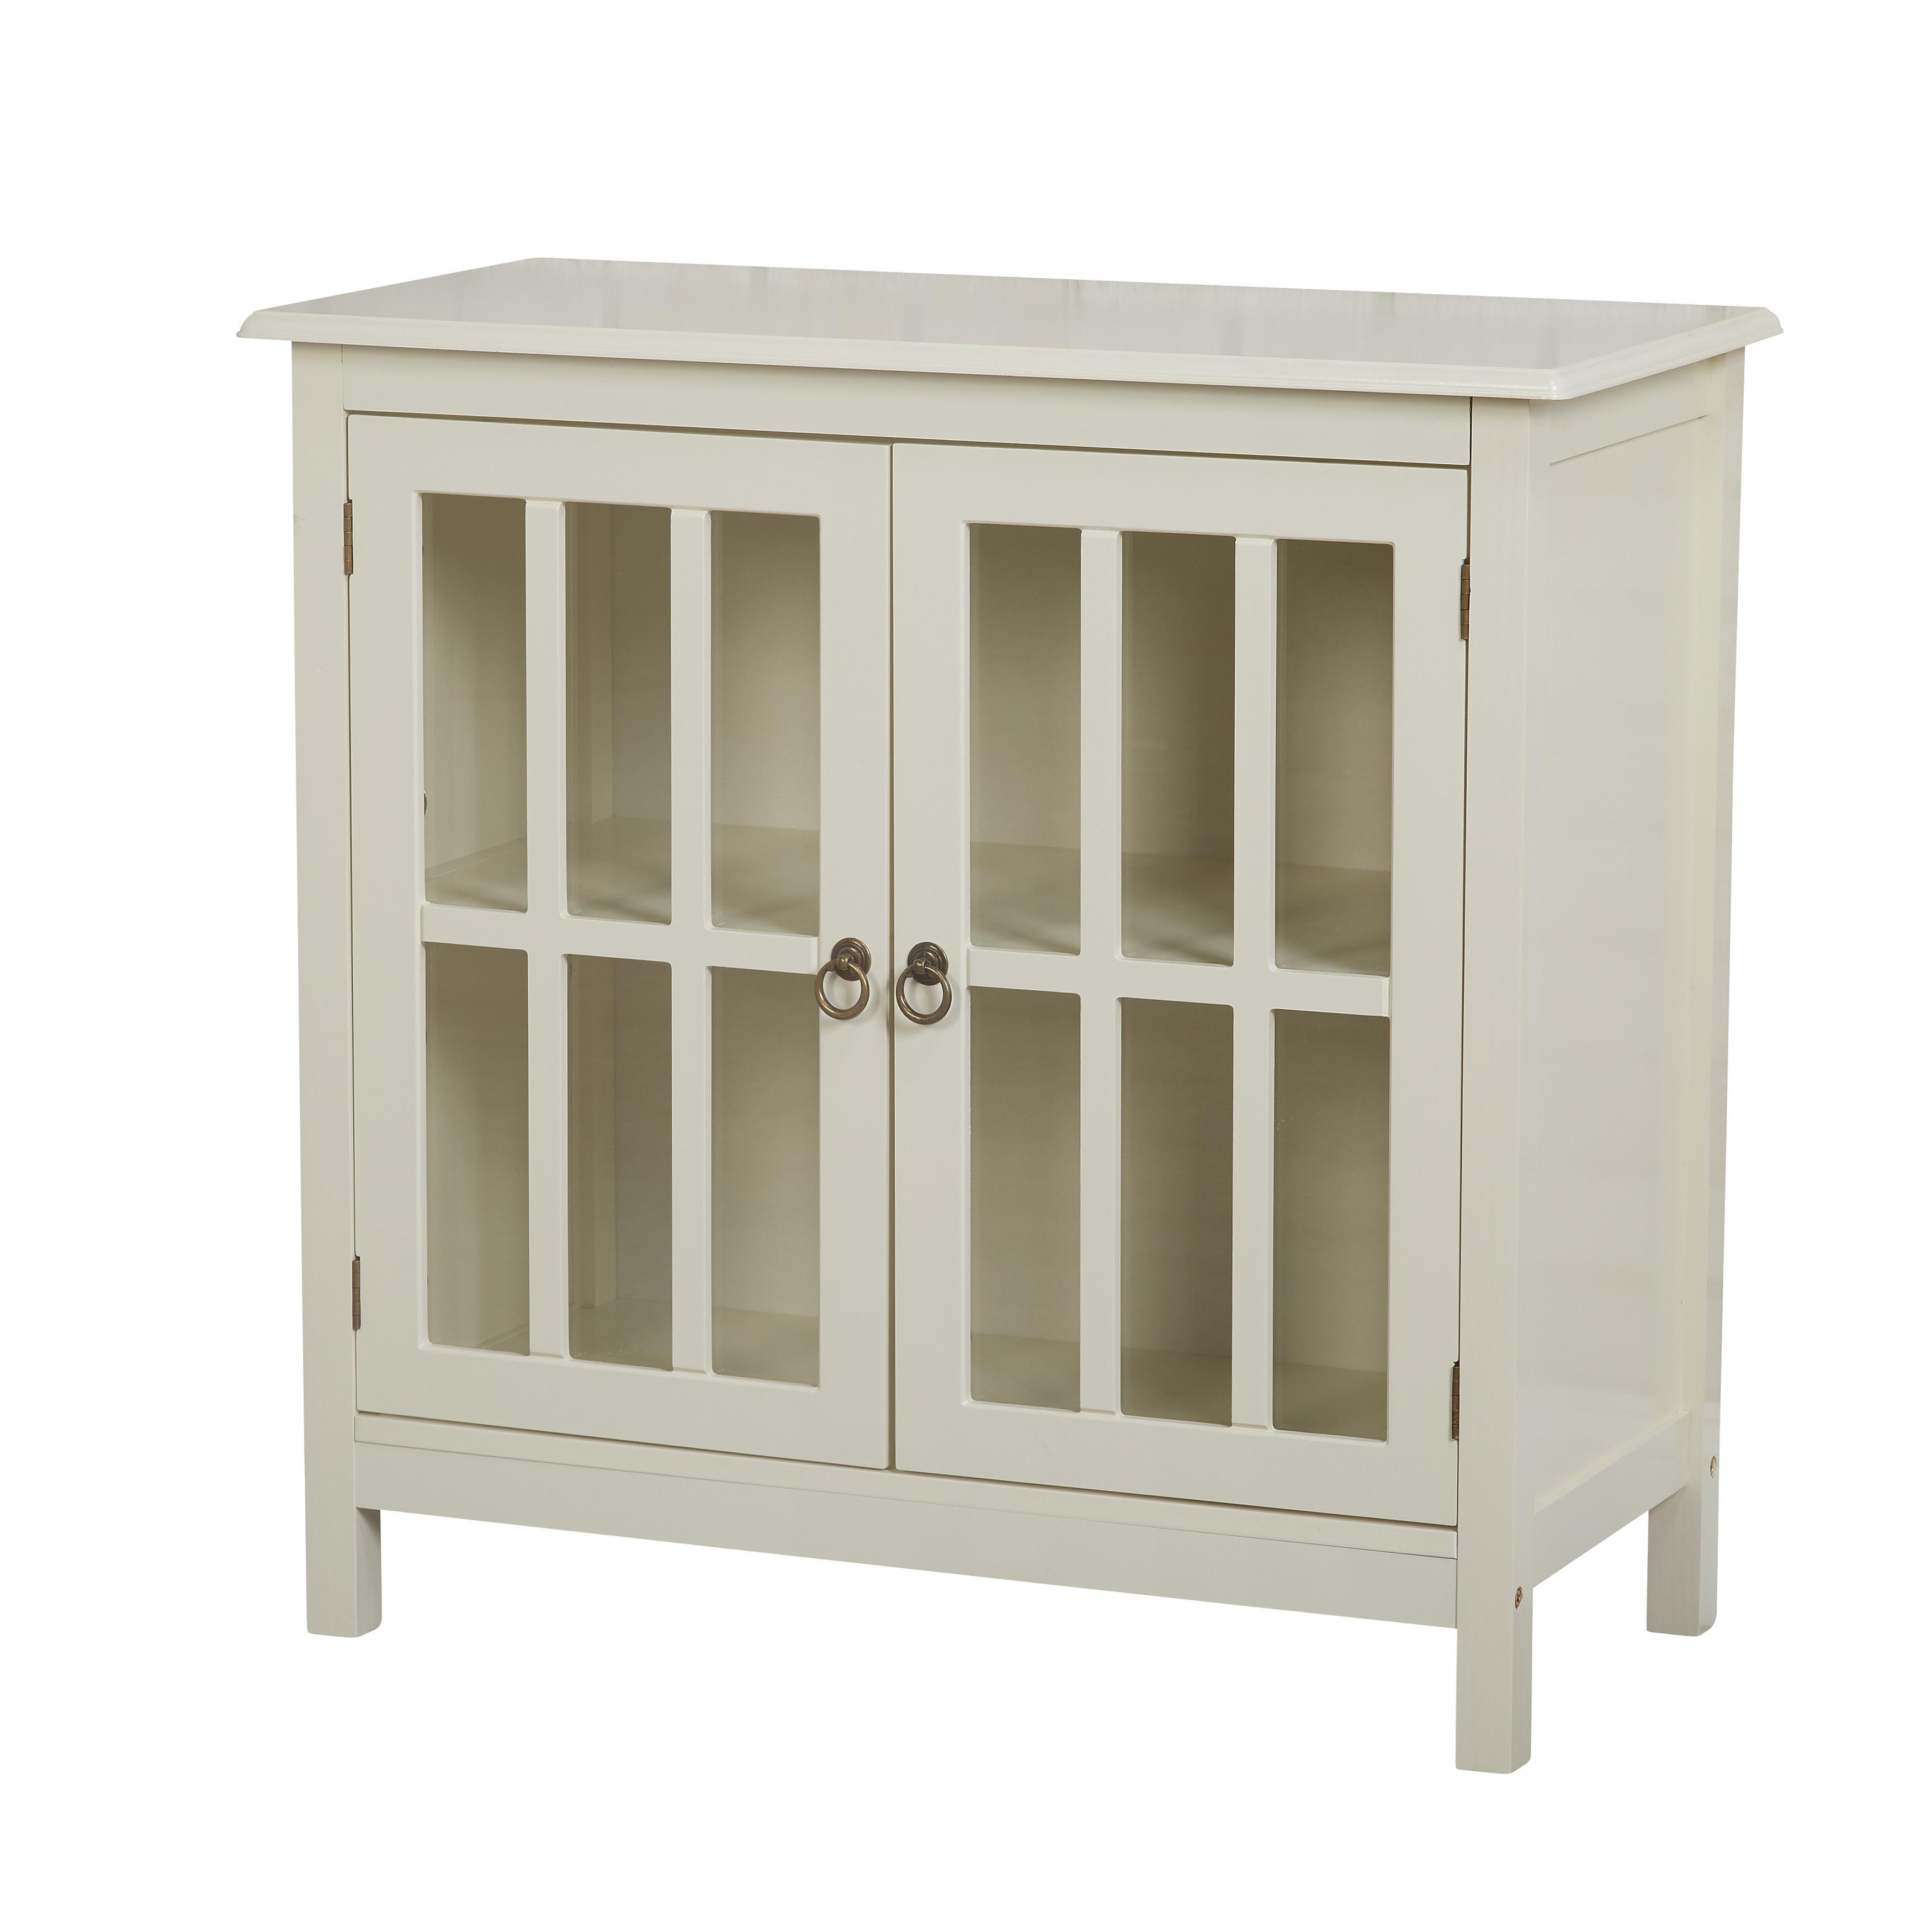 Shop Simple Living Portland Glass Door Cabinet Na On Sale